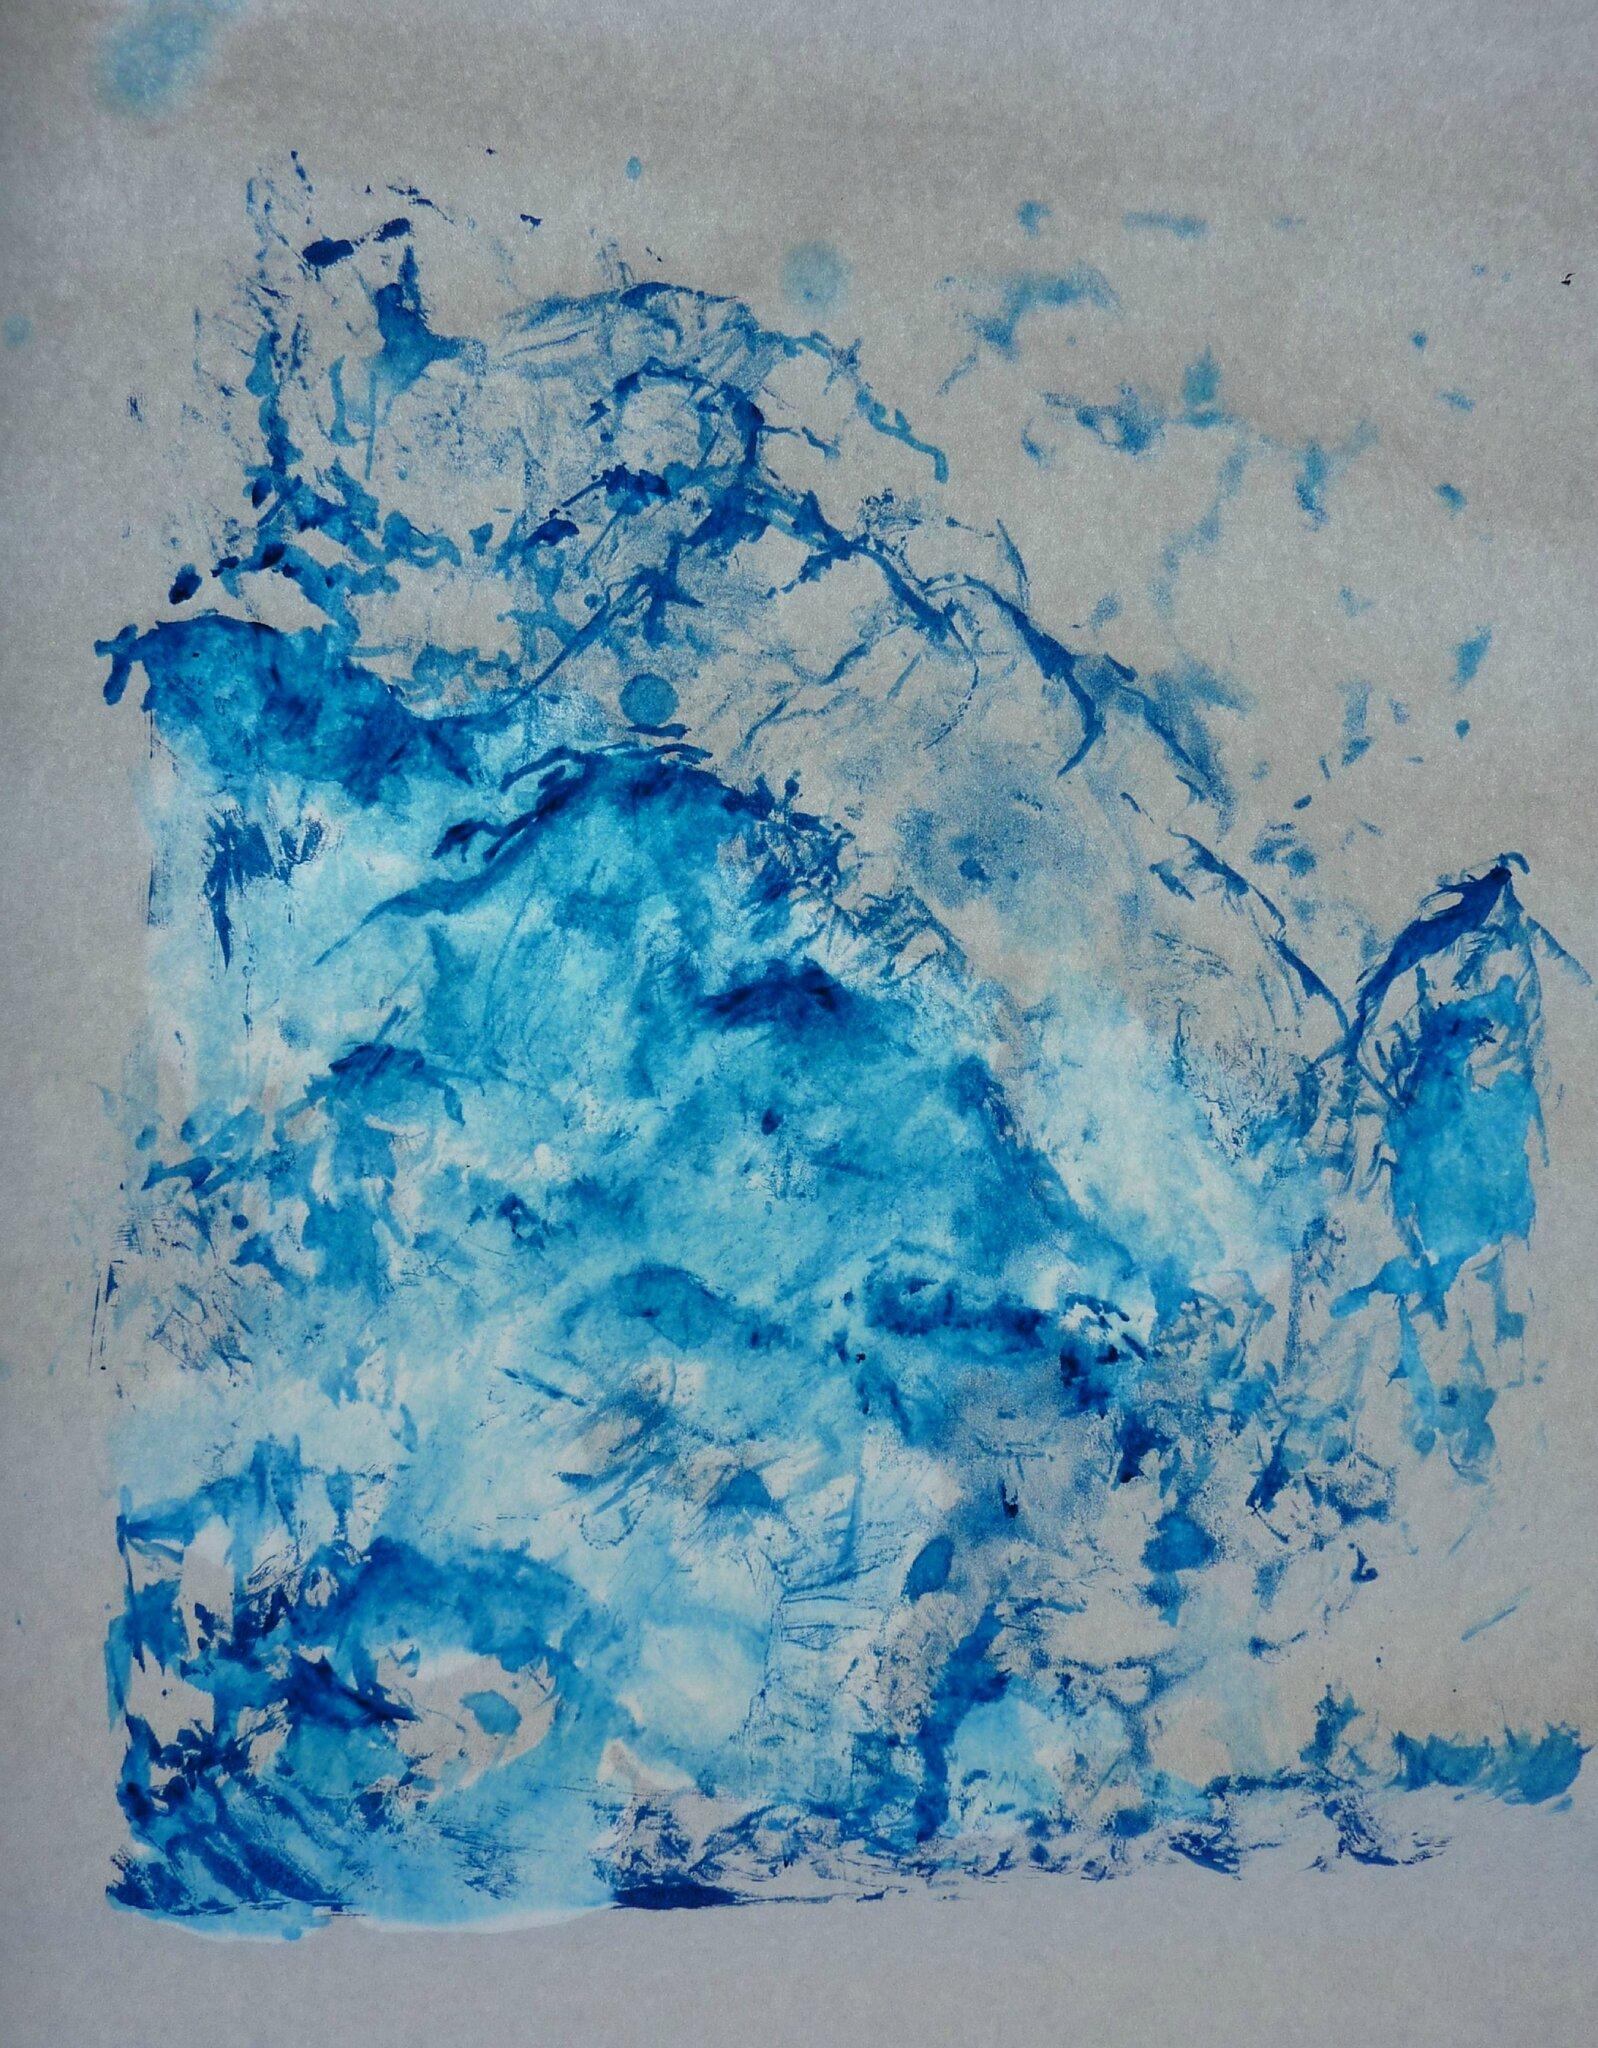 blue mood (1)